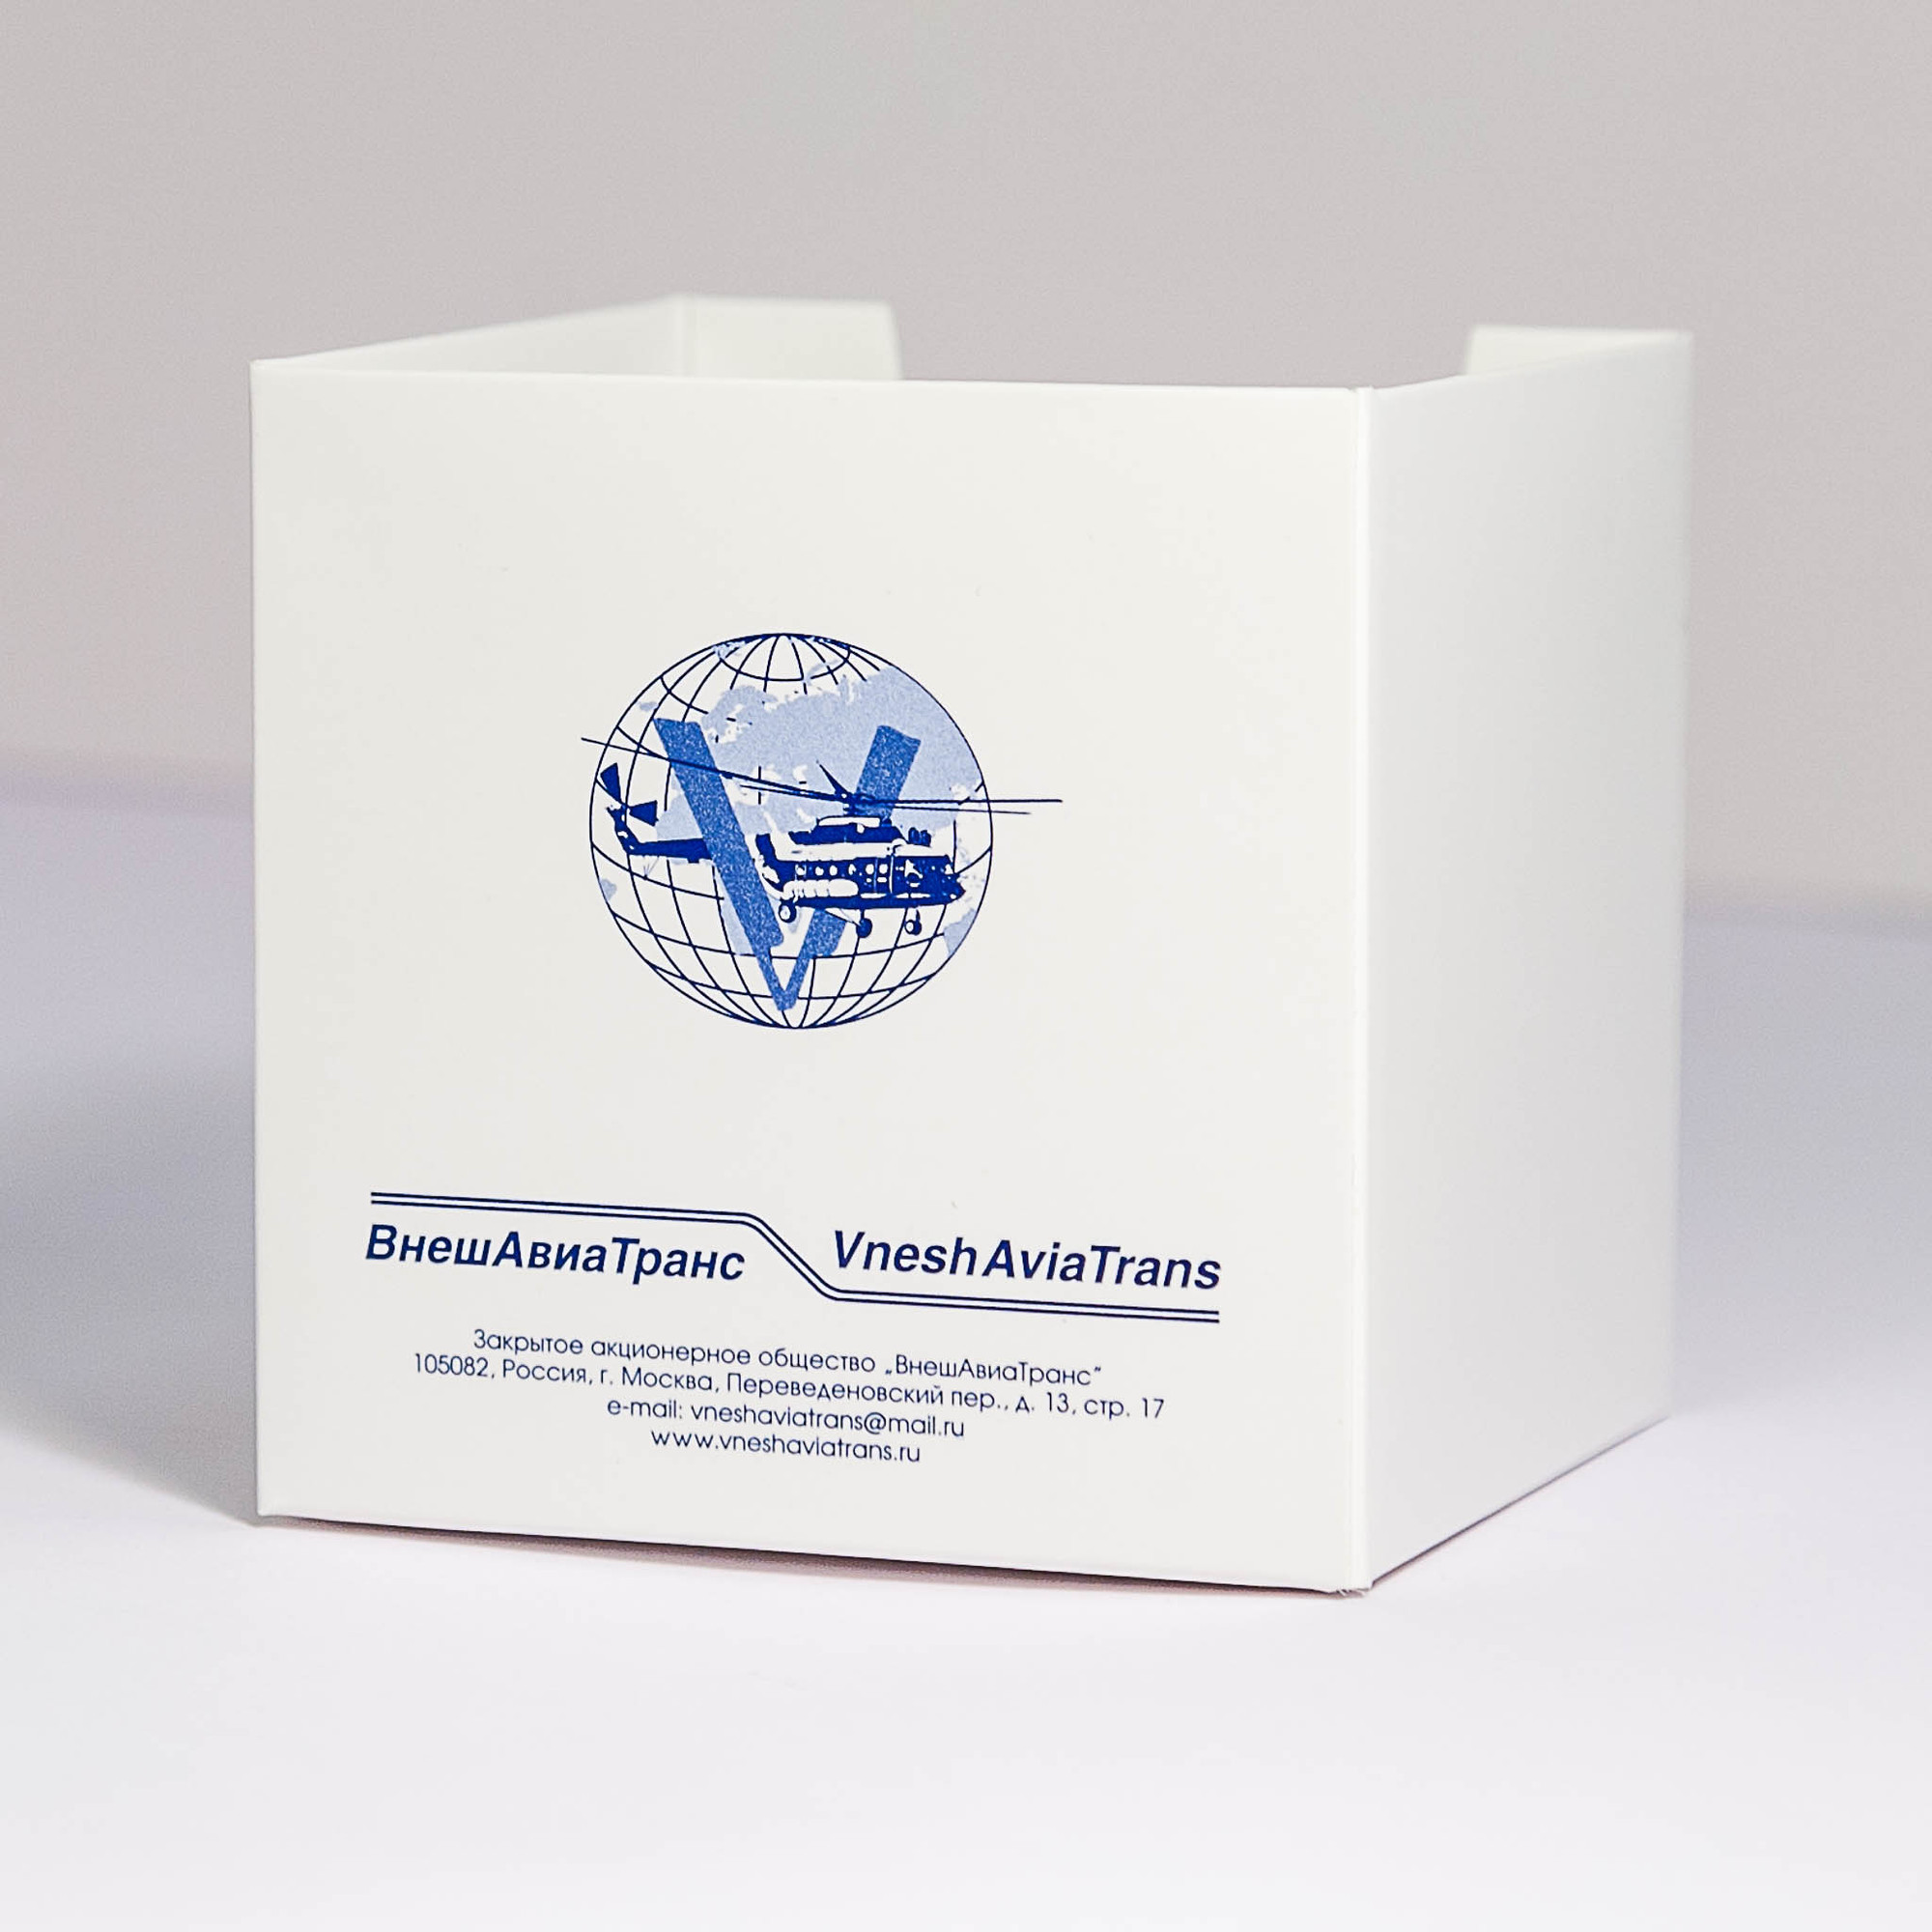 Подставка под кубарик с логотипом и даннми компании